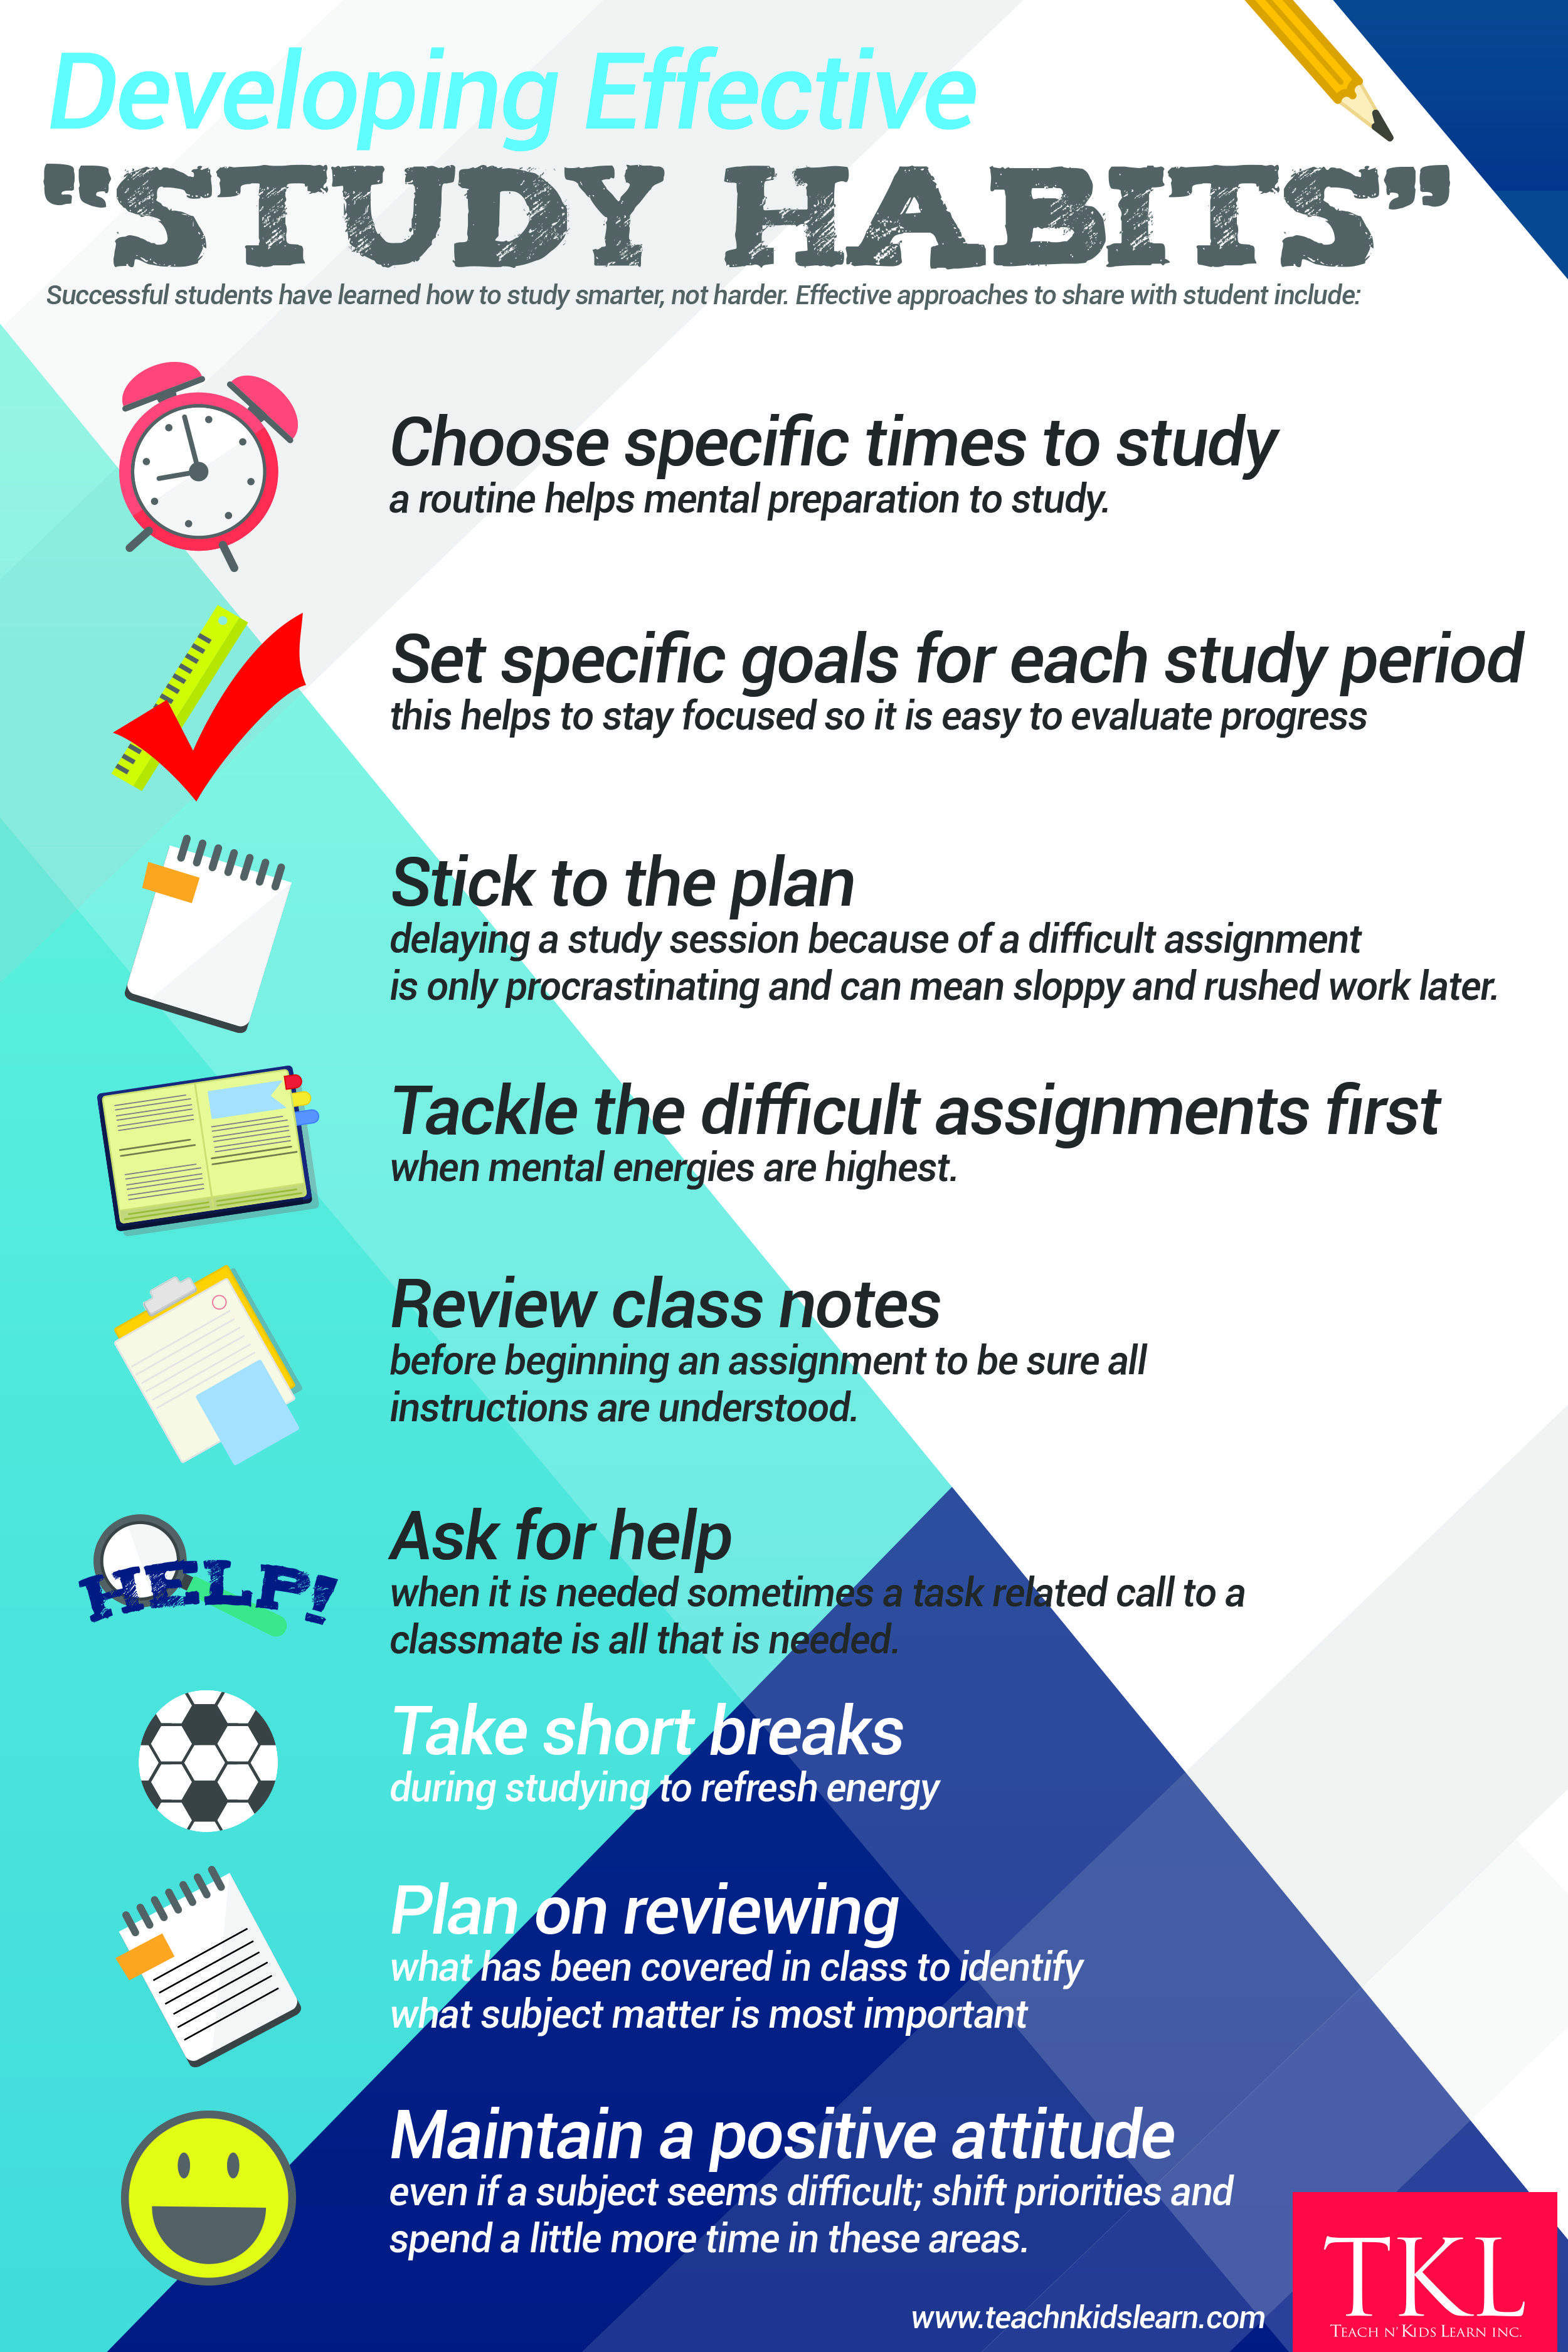 Good homework habits high school kids growing up too fast essay